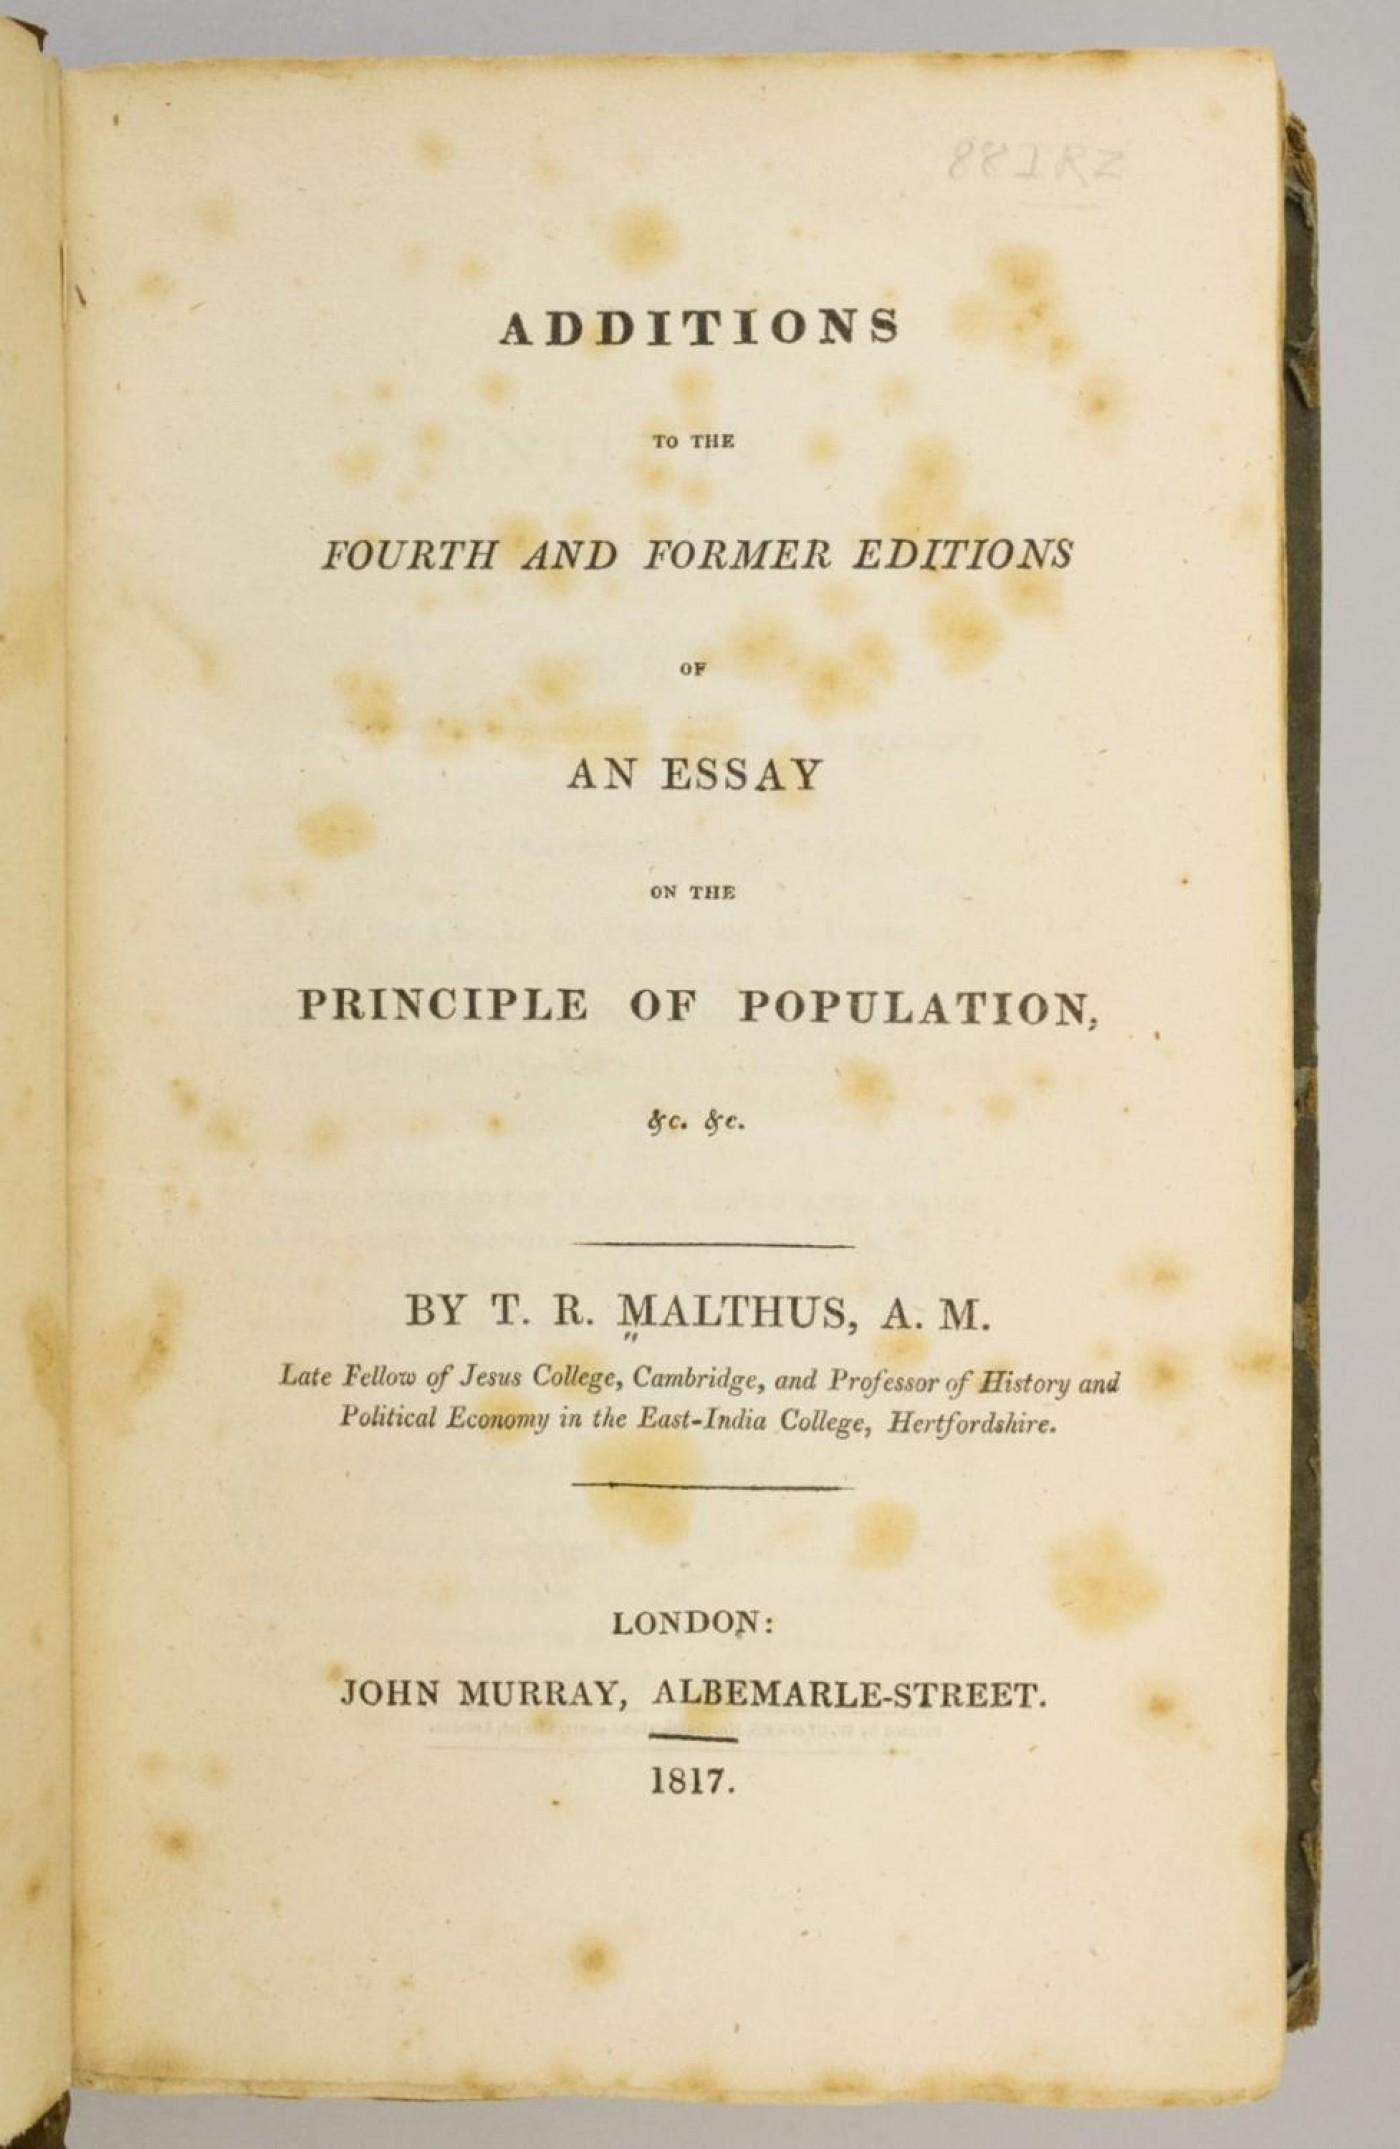 002 Essay Example On The Principle Of Population 5337830061 2 Singular Malthus Sparknotes Thomas Main Idea 1400